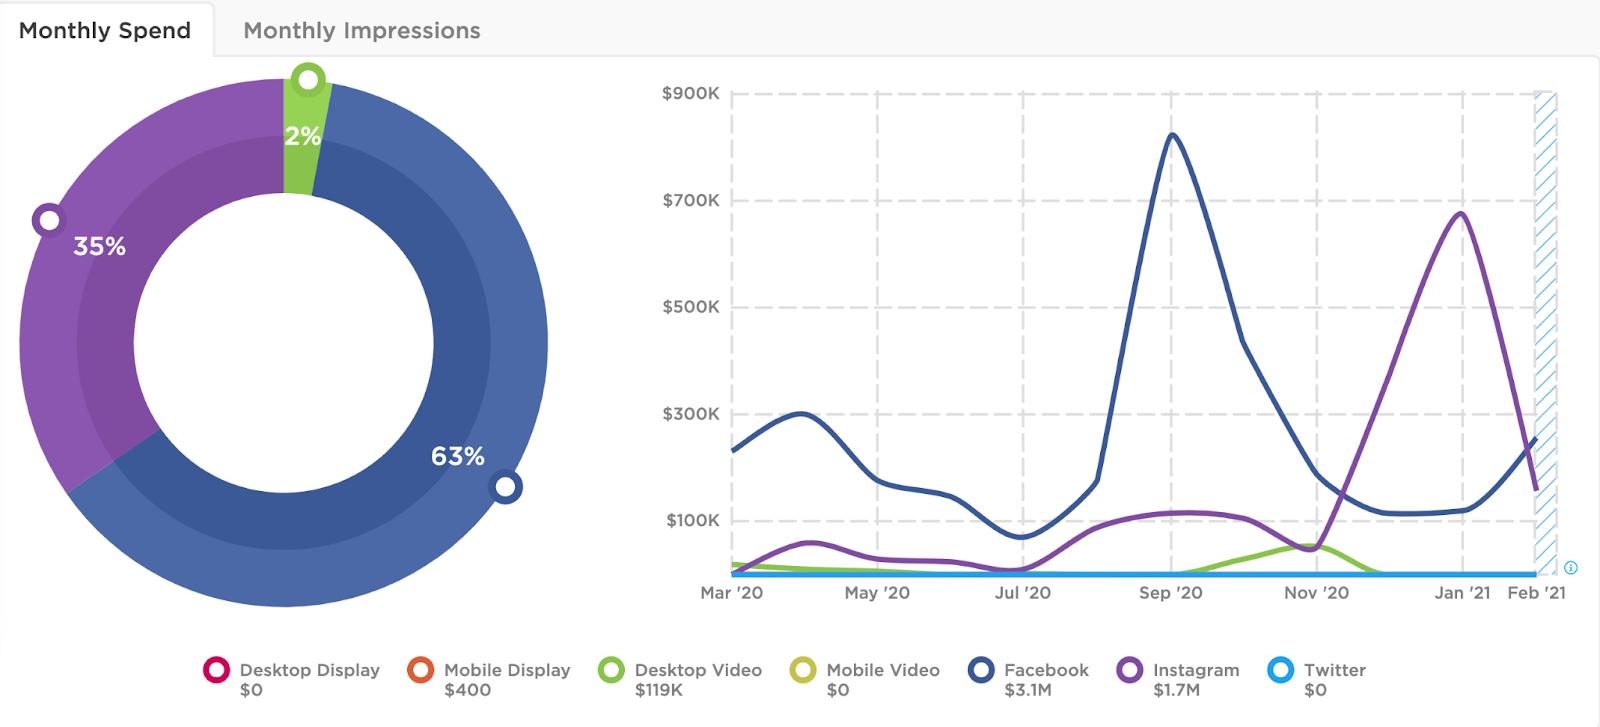 Talkspace spends heavily on Facebook